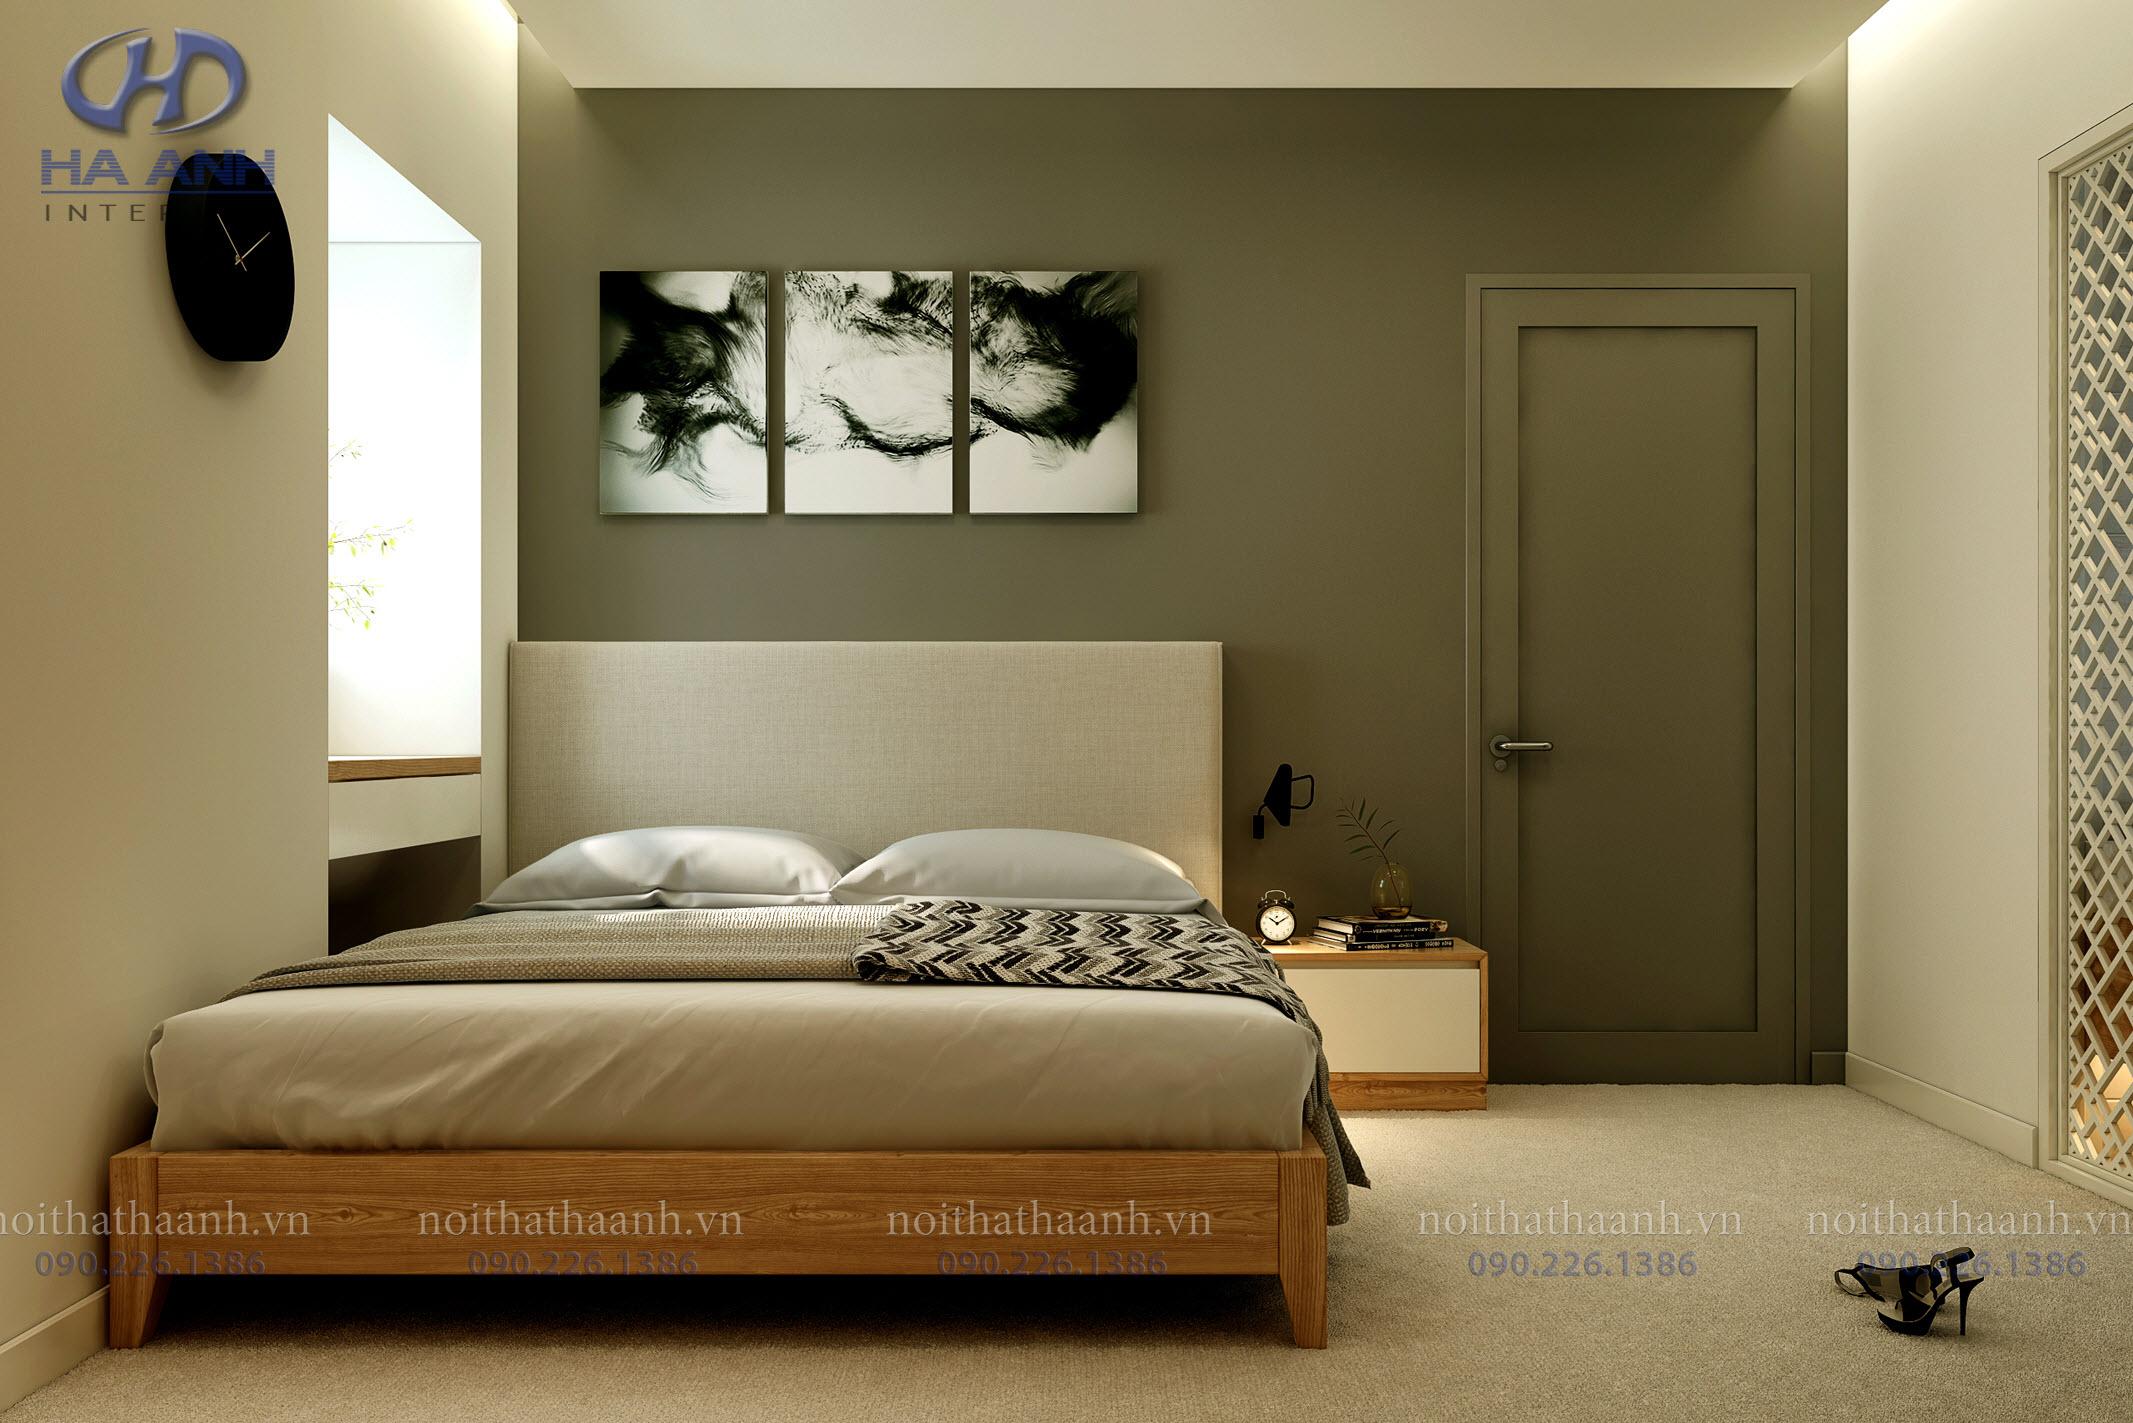 Giường ngủ laminate HA-8309